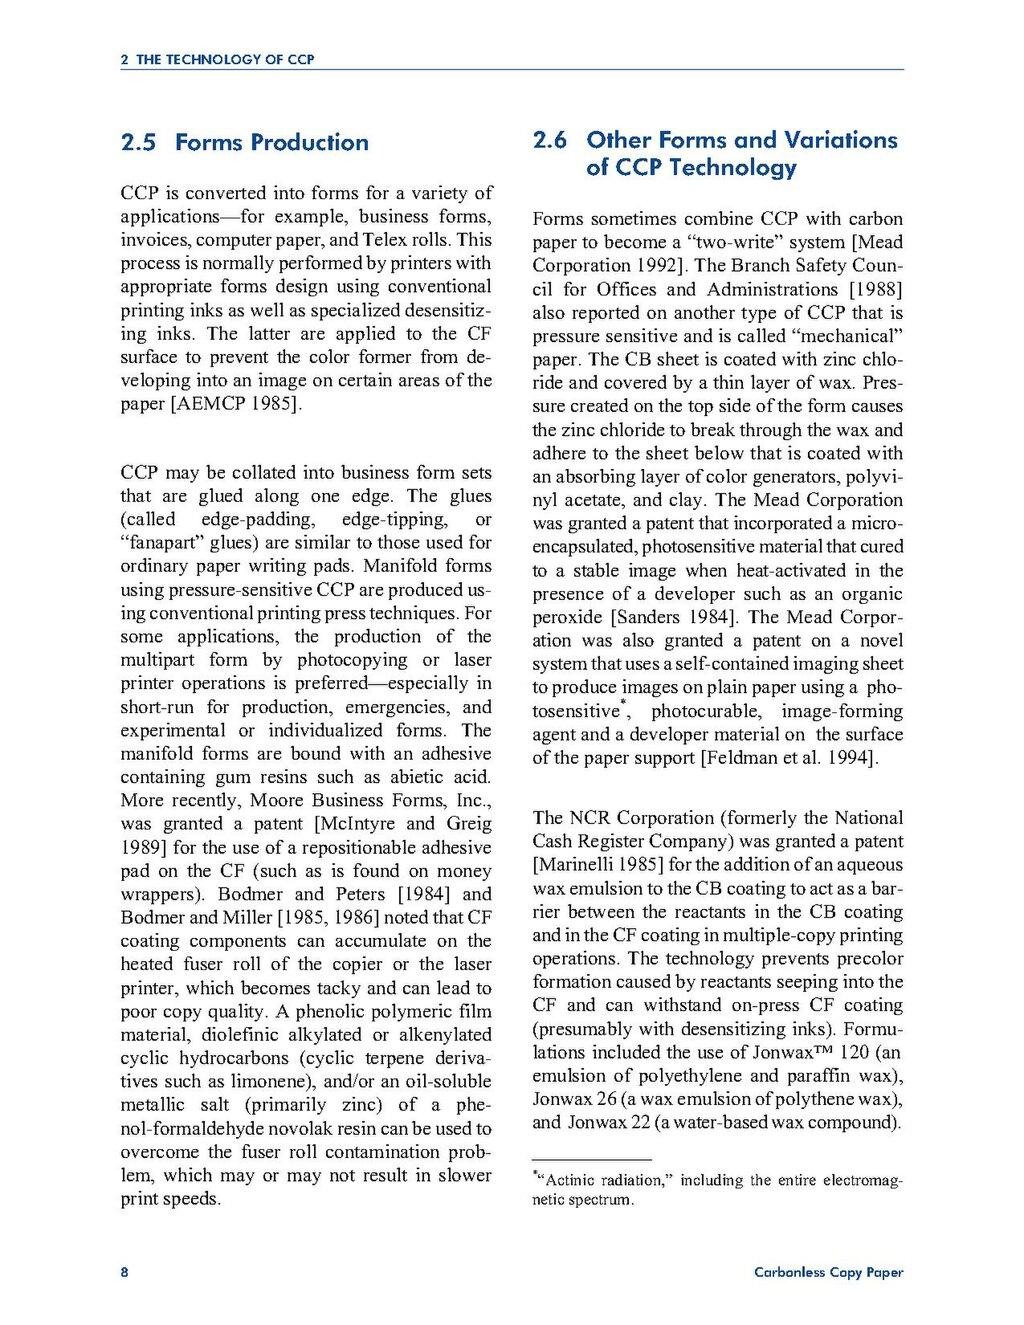 page niosh hazard review of carbonless copy paper pdf 29